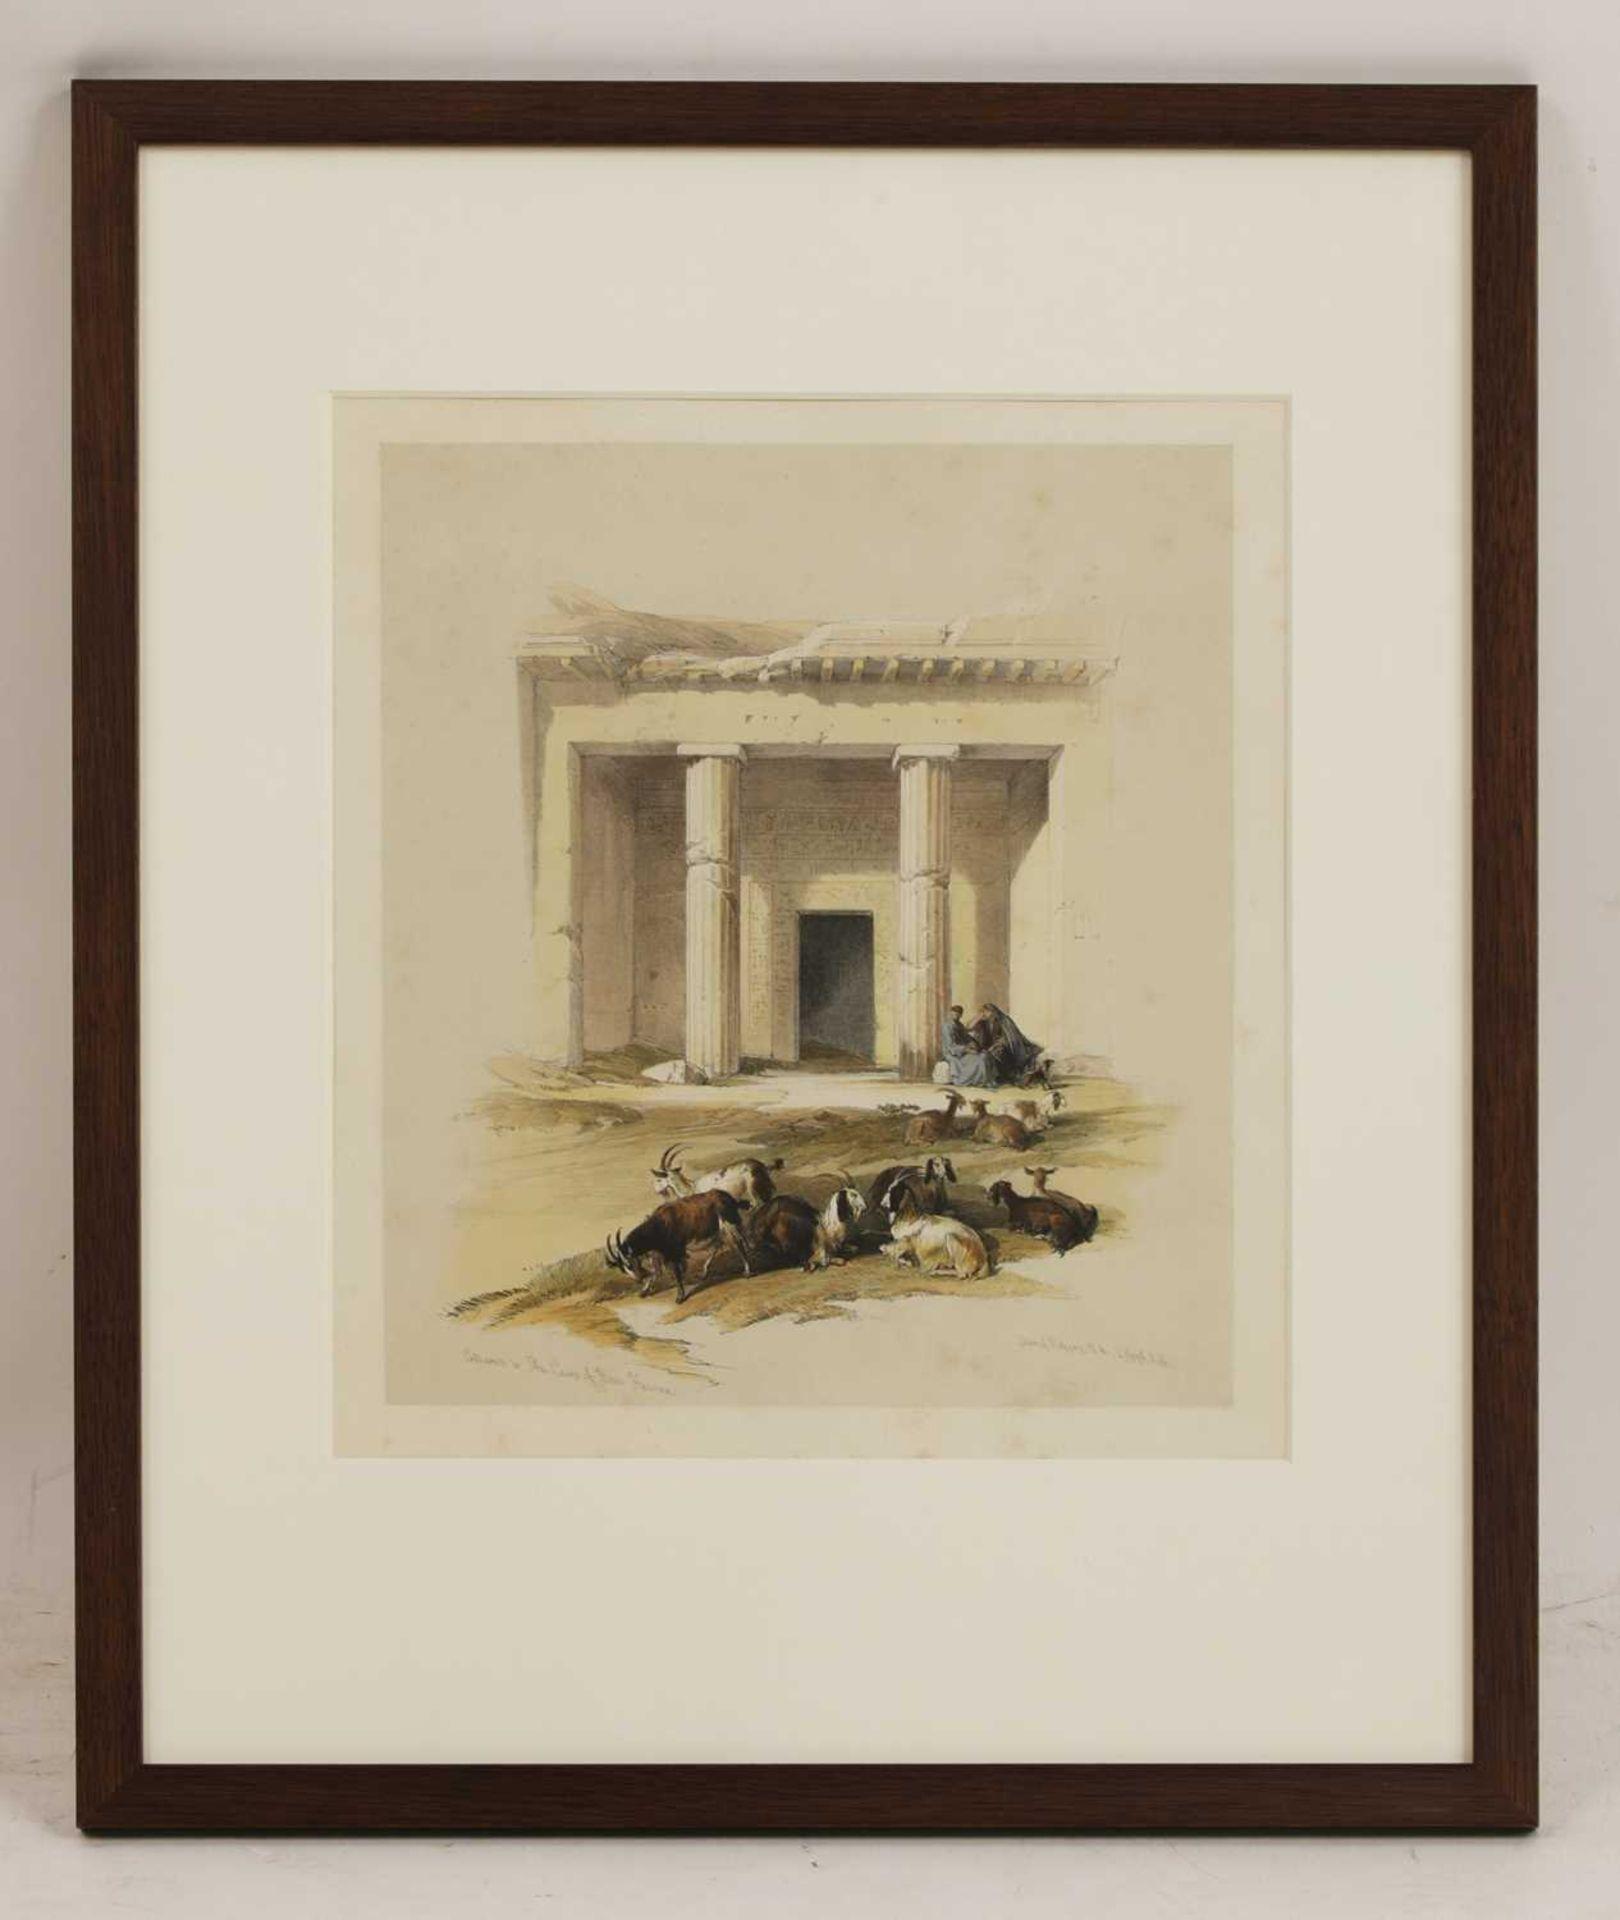 Louis Haghe after David Roberts RA (1796-1864) - Image 13 of 20